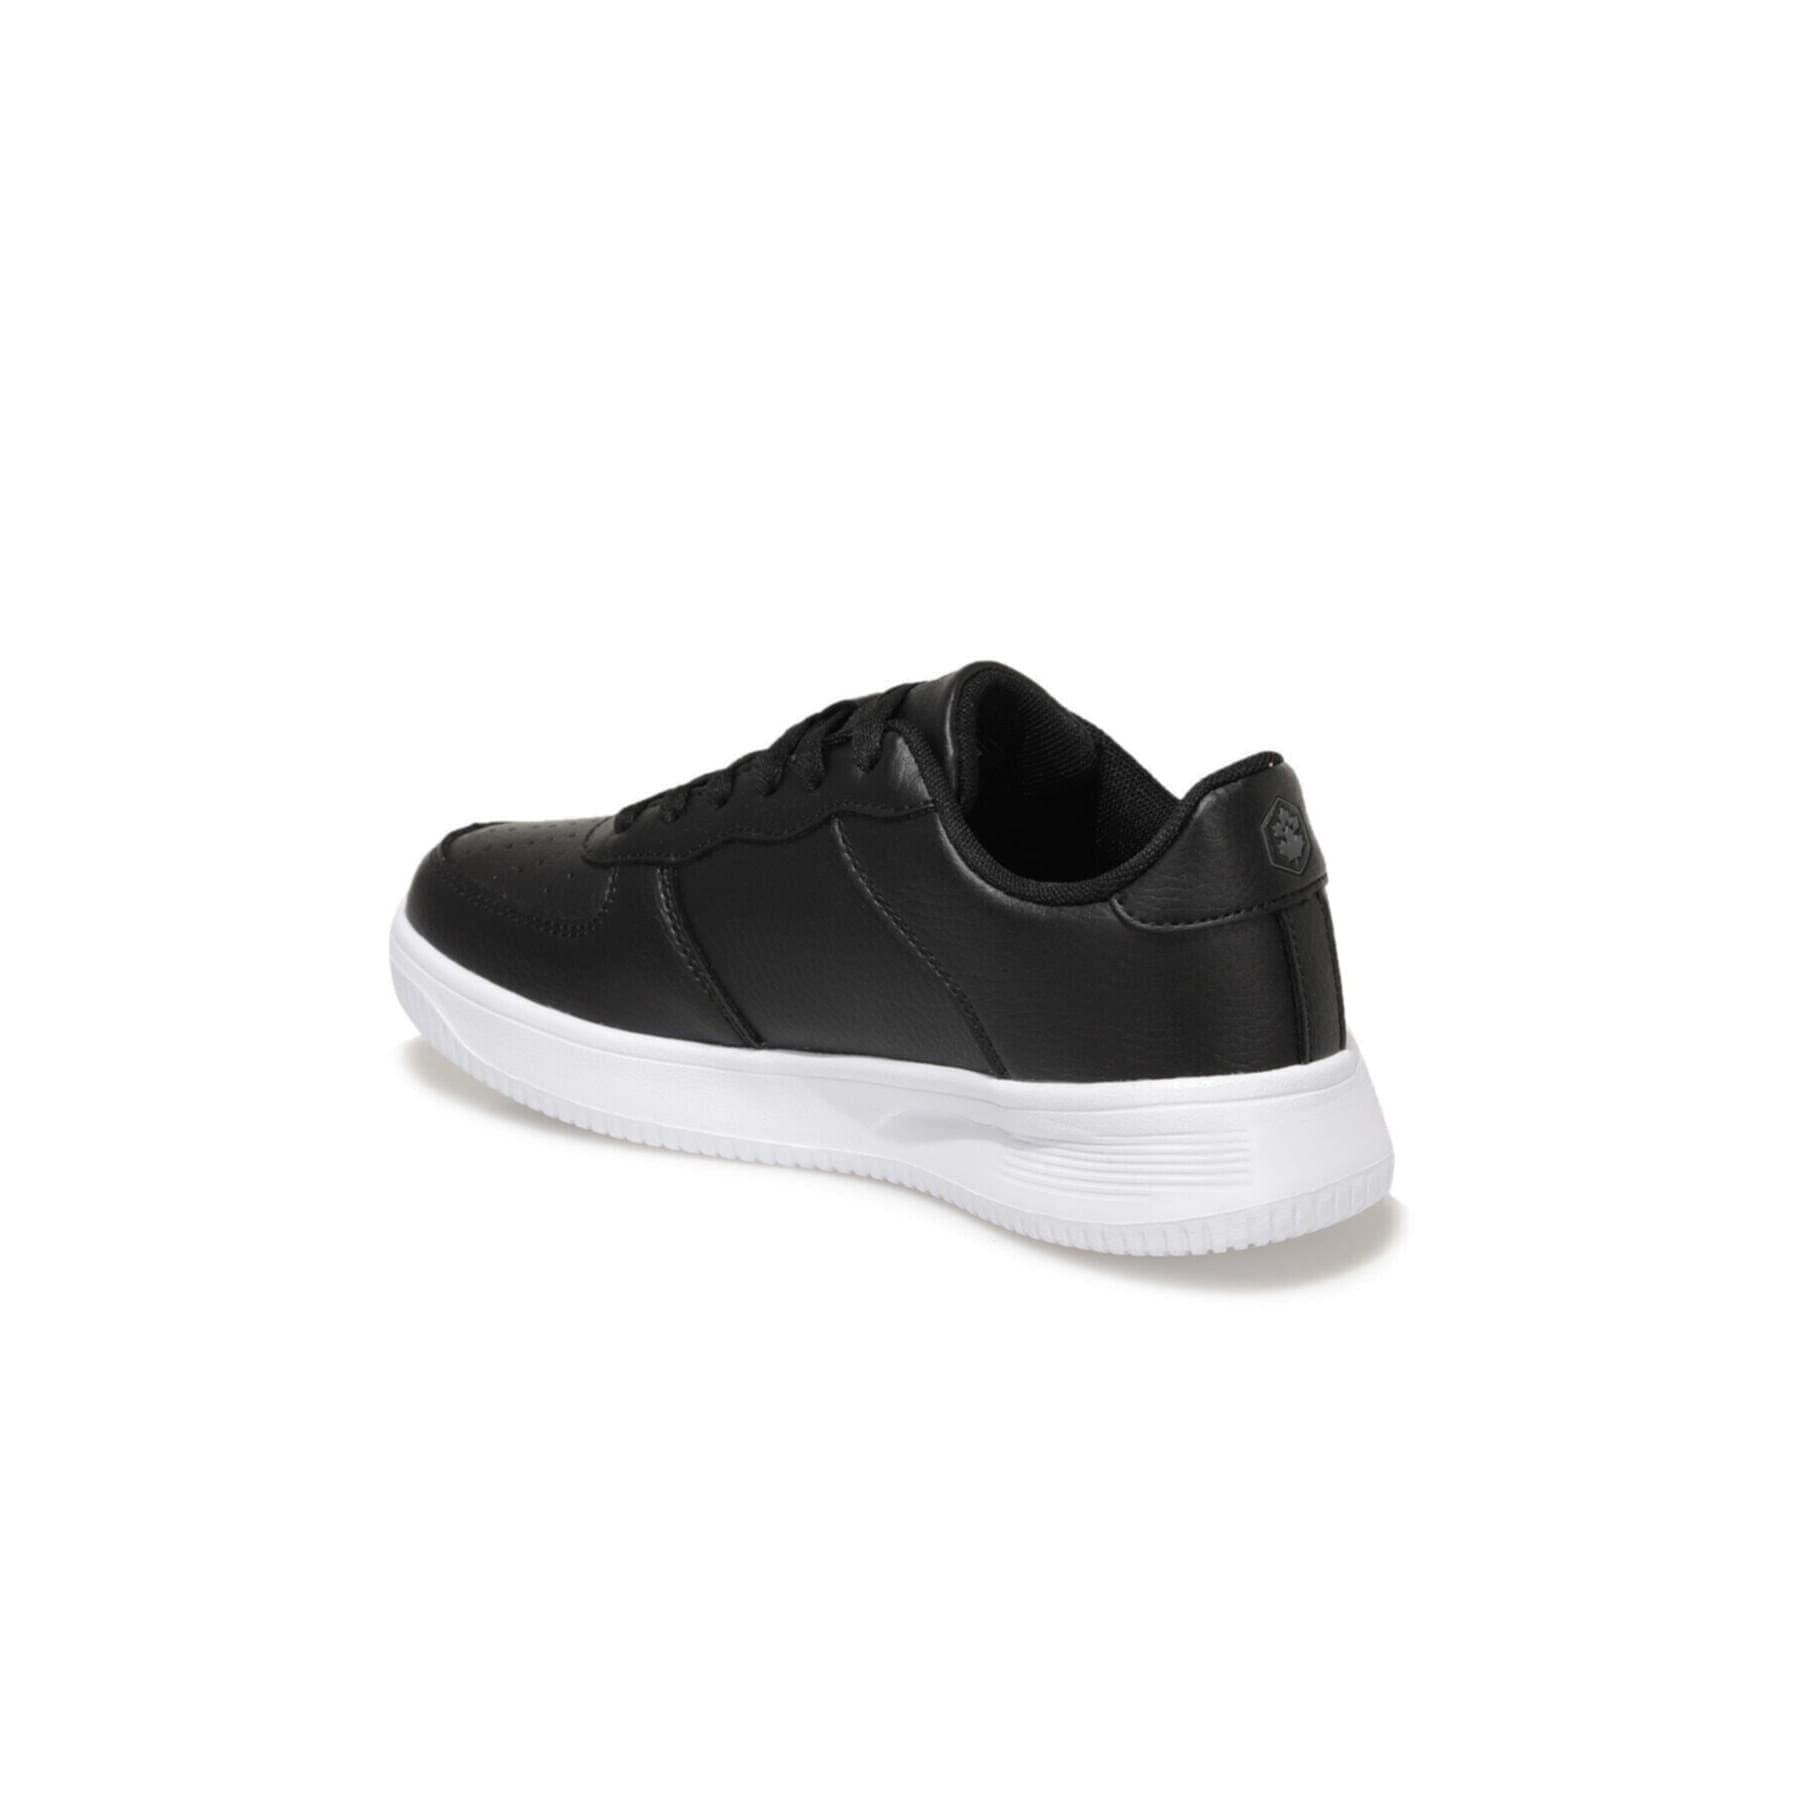 Finster Erkek Siyah Sneaker Ayakkabı (101011318)